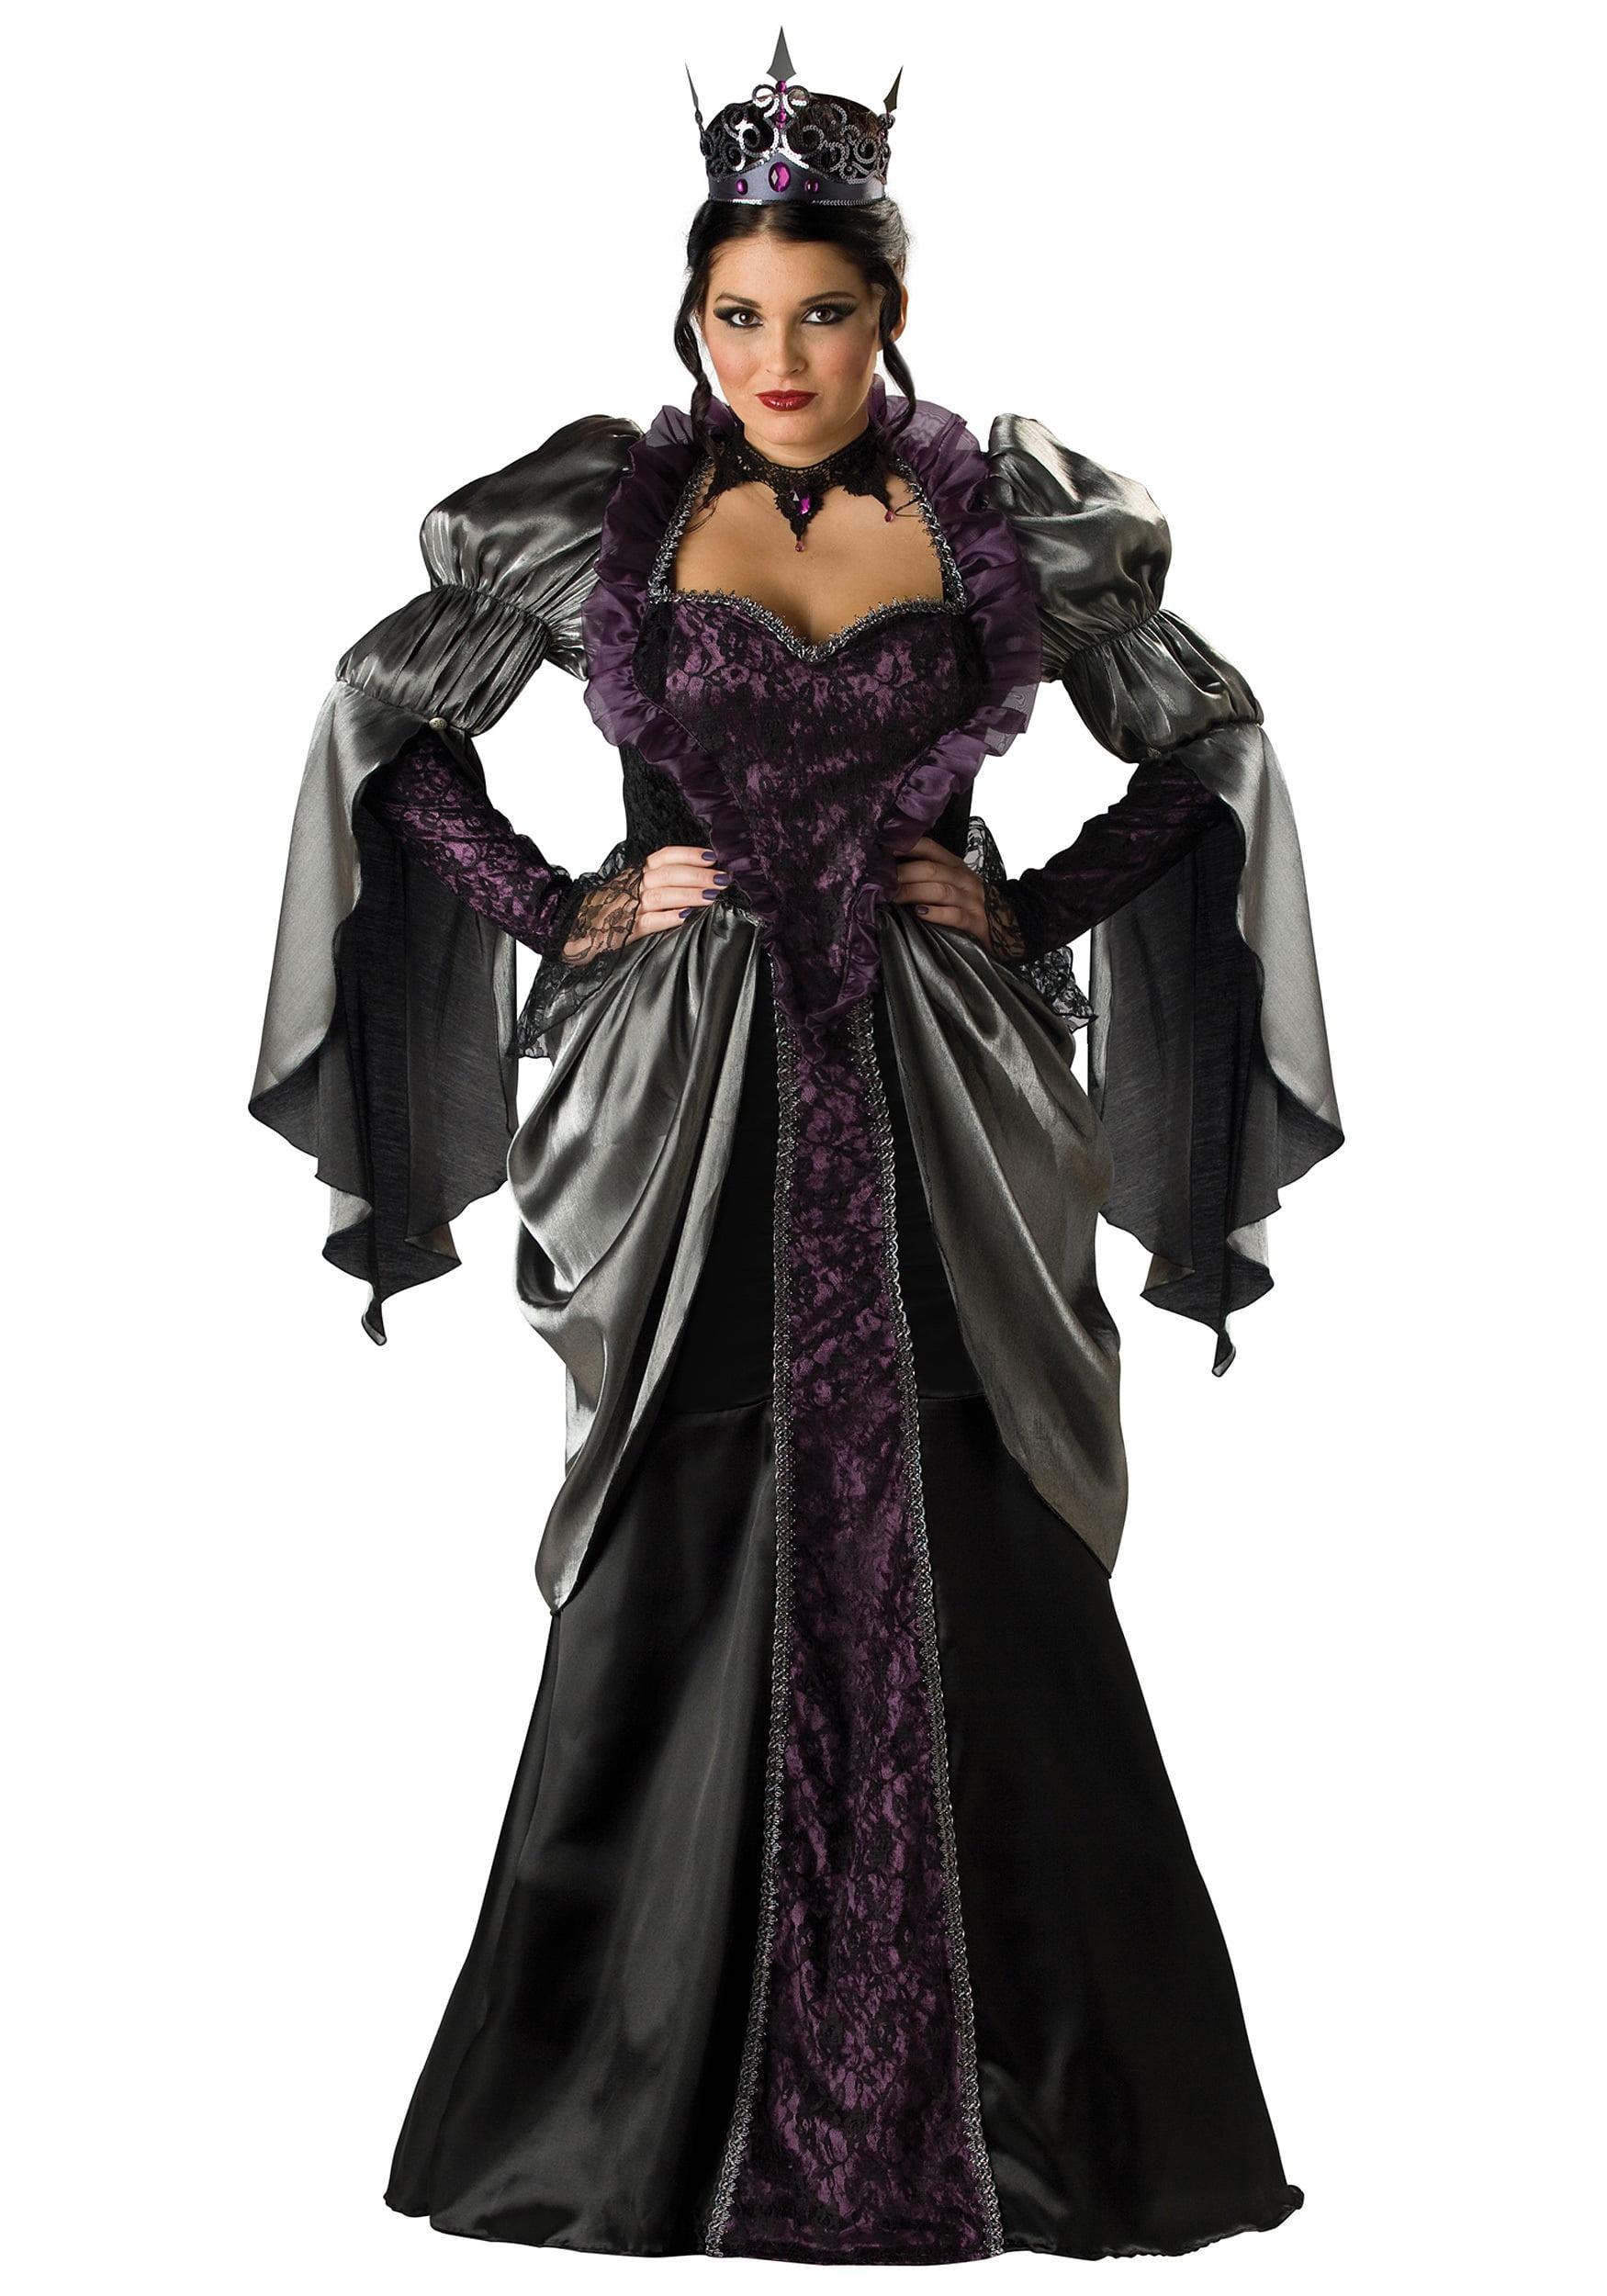 Ladies Wicked Queen Costume Book Week Halloween Fancy Dress Outfit